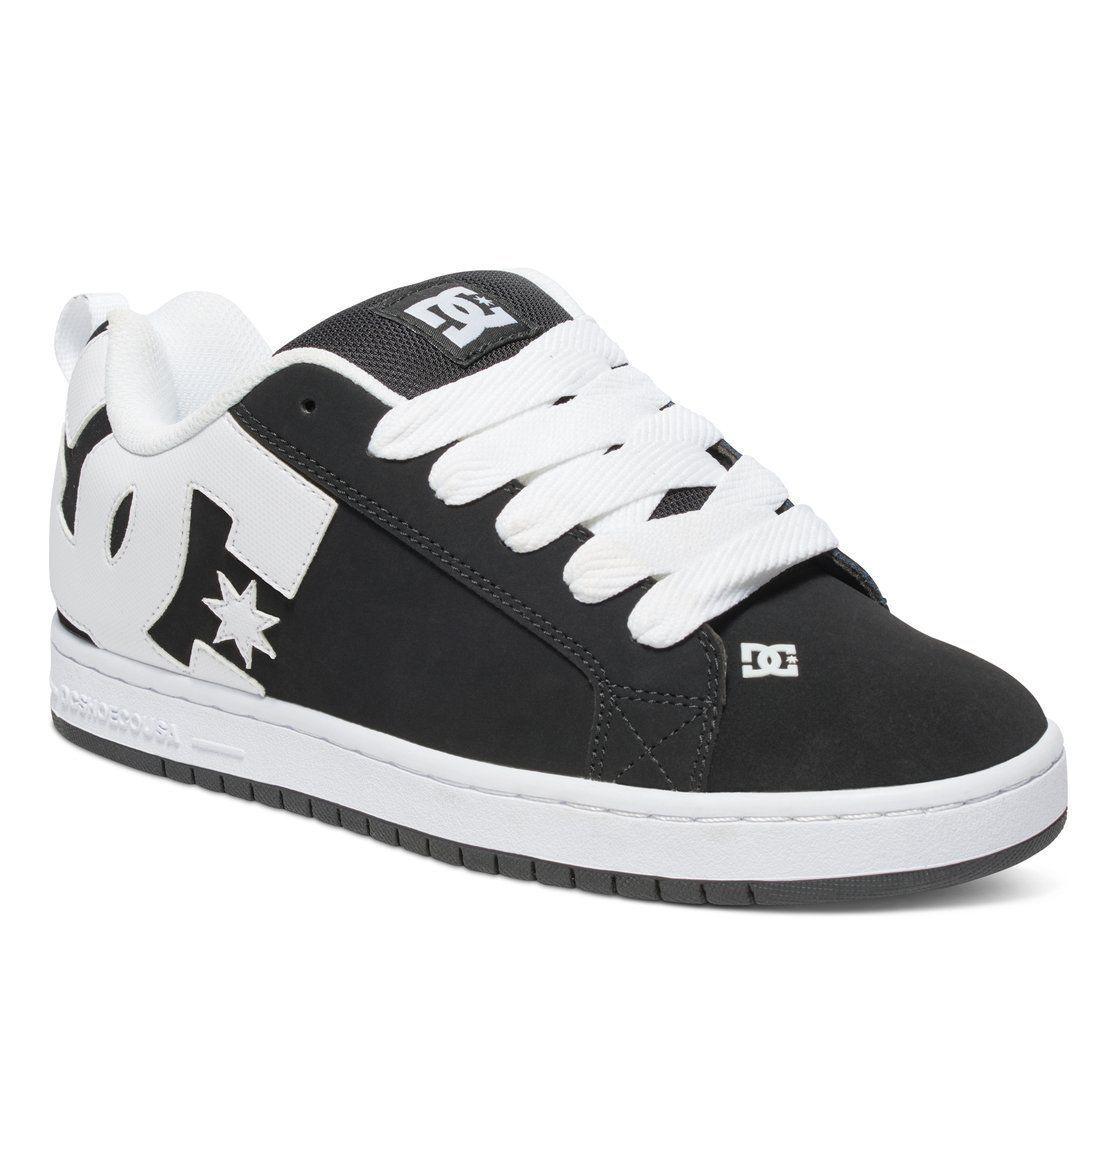 Skate shoes size 9 - Dc Shoes Skate Court Graffik Black White 300529 Xkw Mens Uk Sizes 9 13